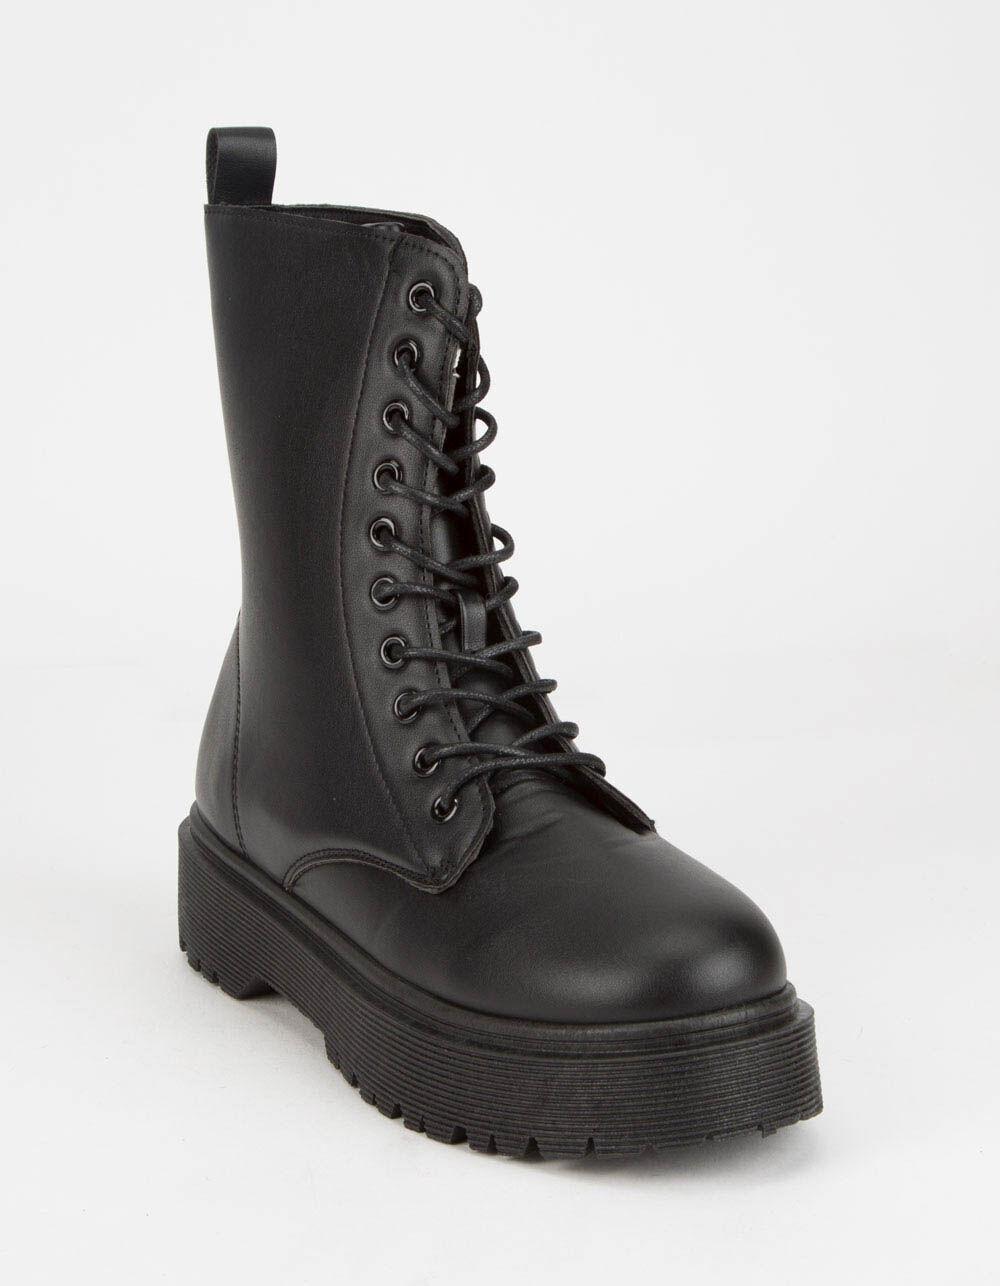 WILD DIVA Lug Sole Lace Up Combat Boots